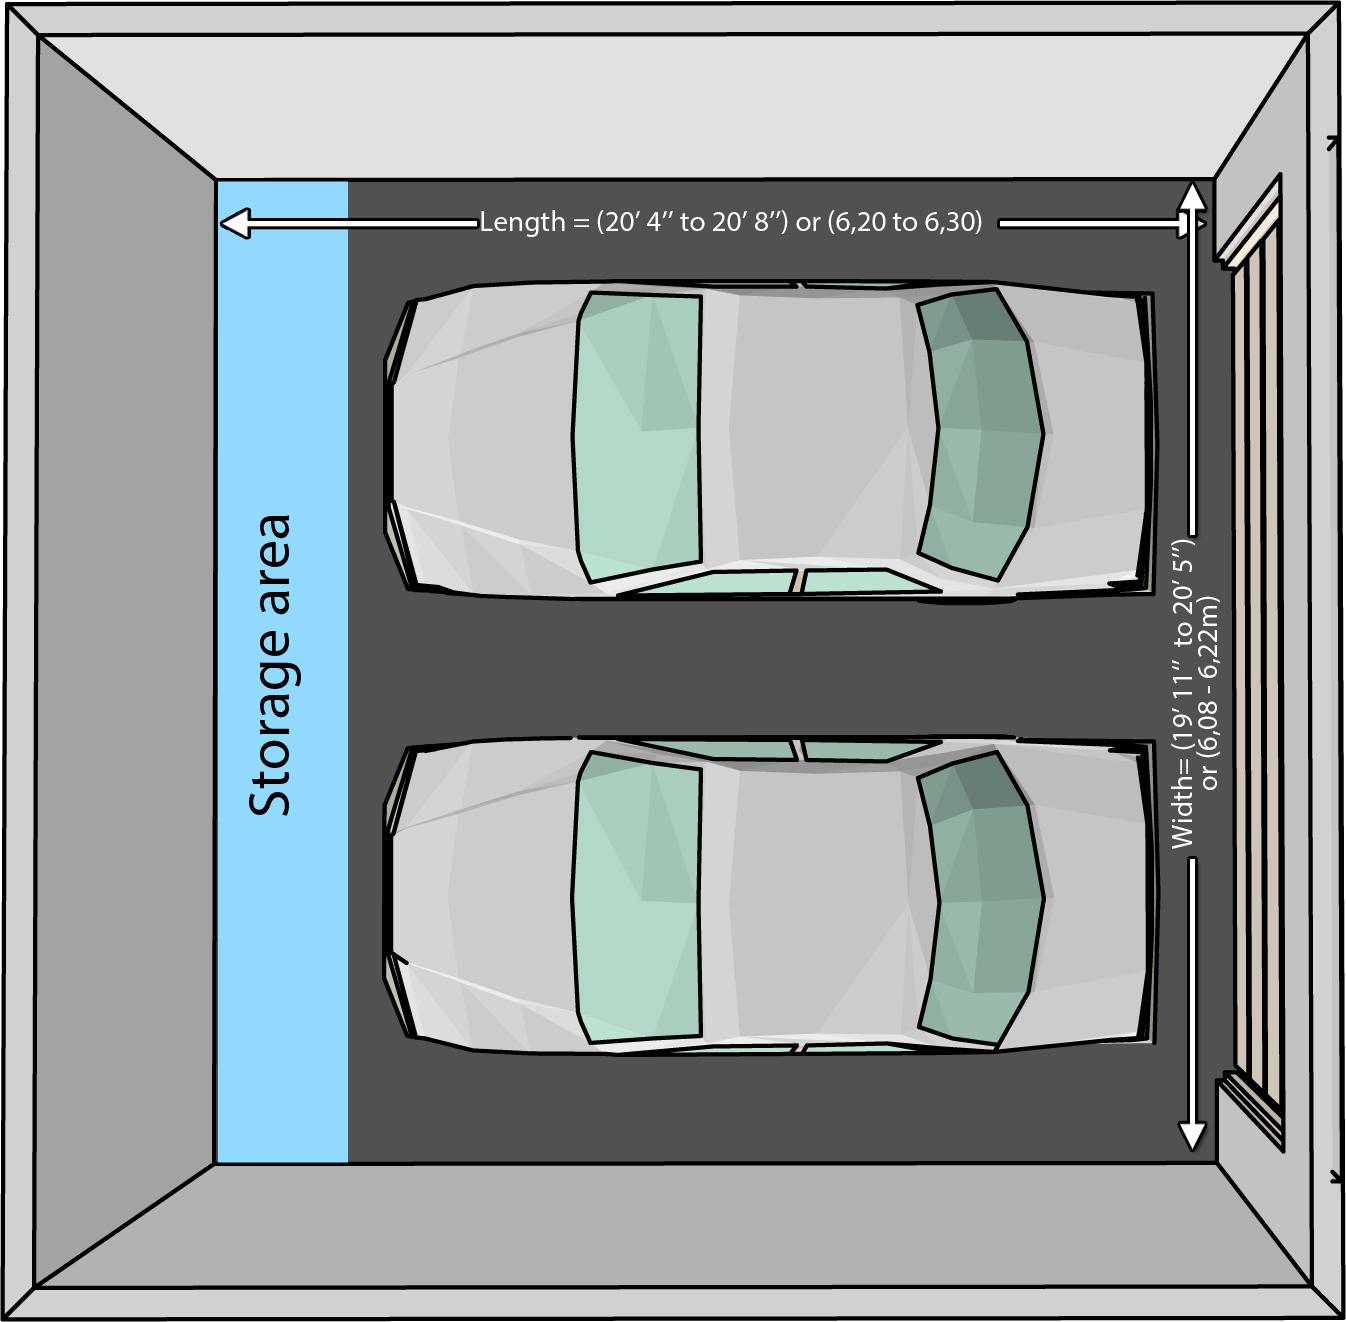 Fullsize Of Two Car Garage Size